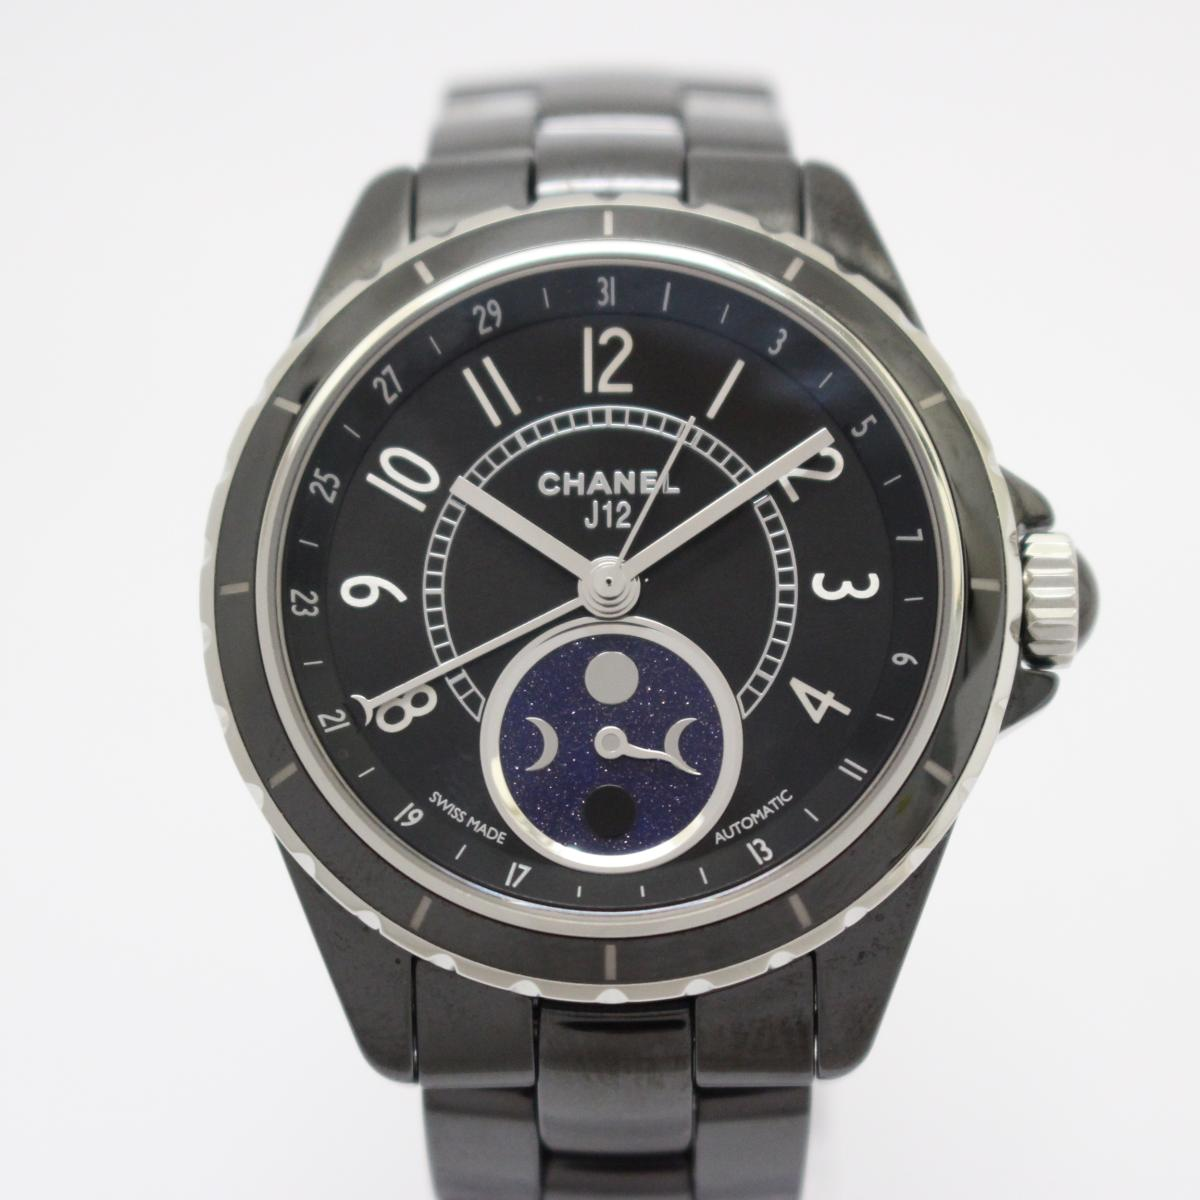 J12 ファーズ ドゥ リュヌ メンズウォッチ 腕時計